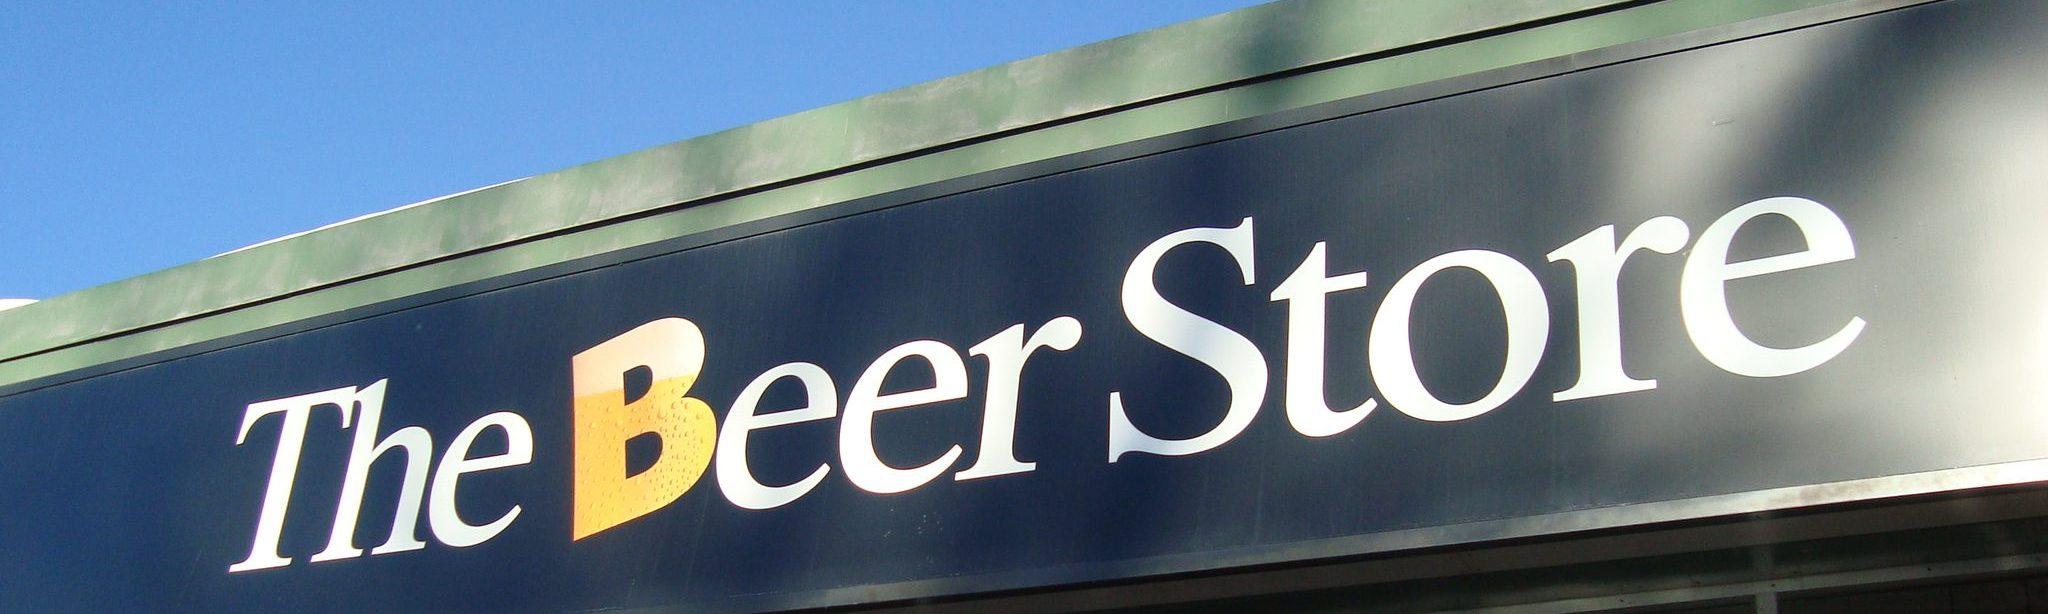 Alkoholische Getränke in Kanada. Der Beer Store